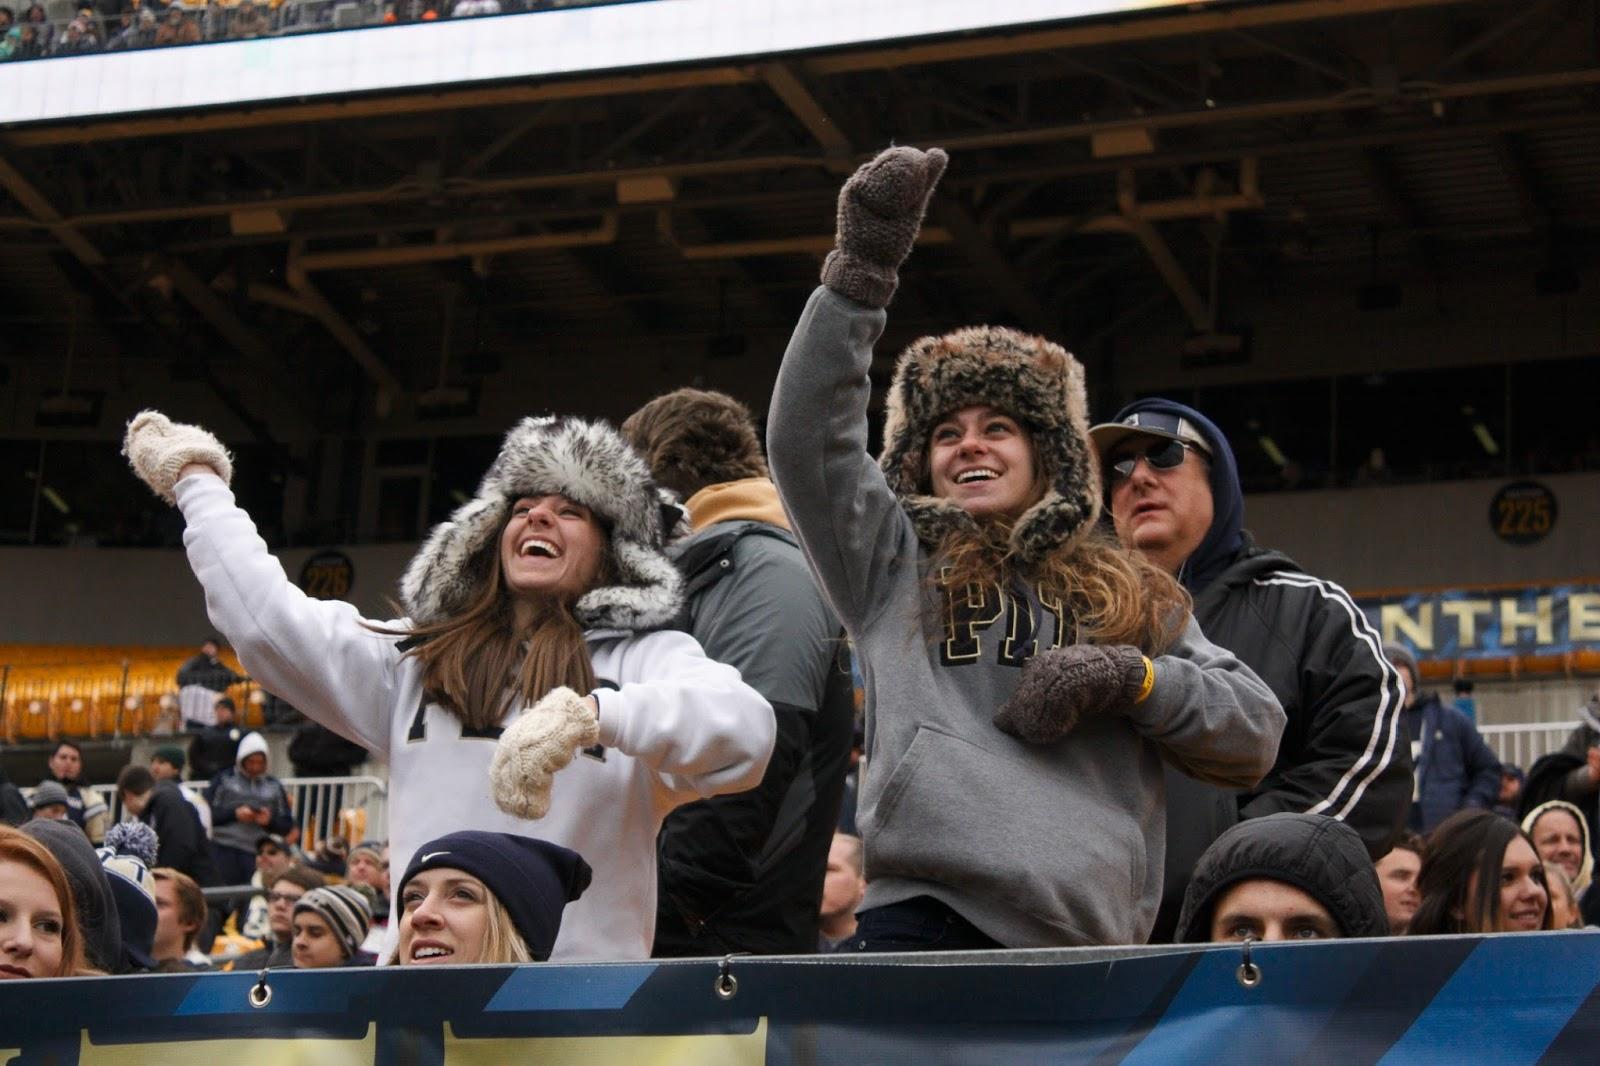 Panthers Down Orange in Football Scoring Spree